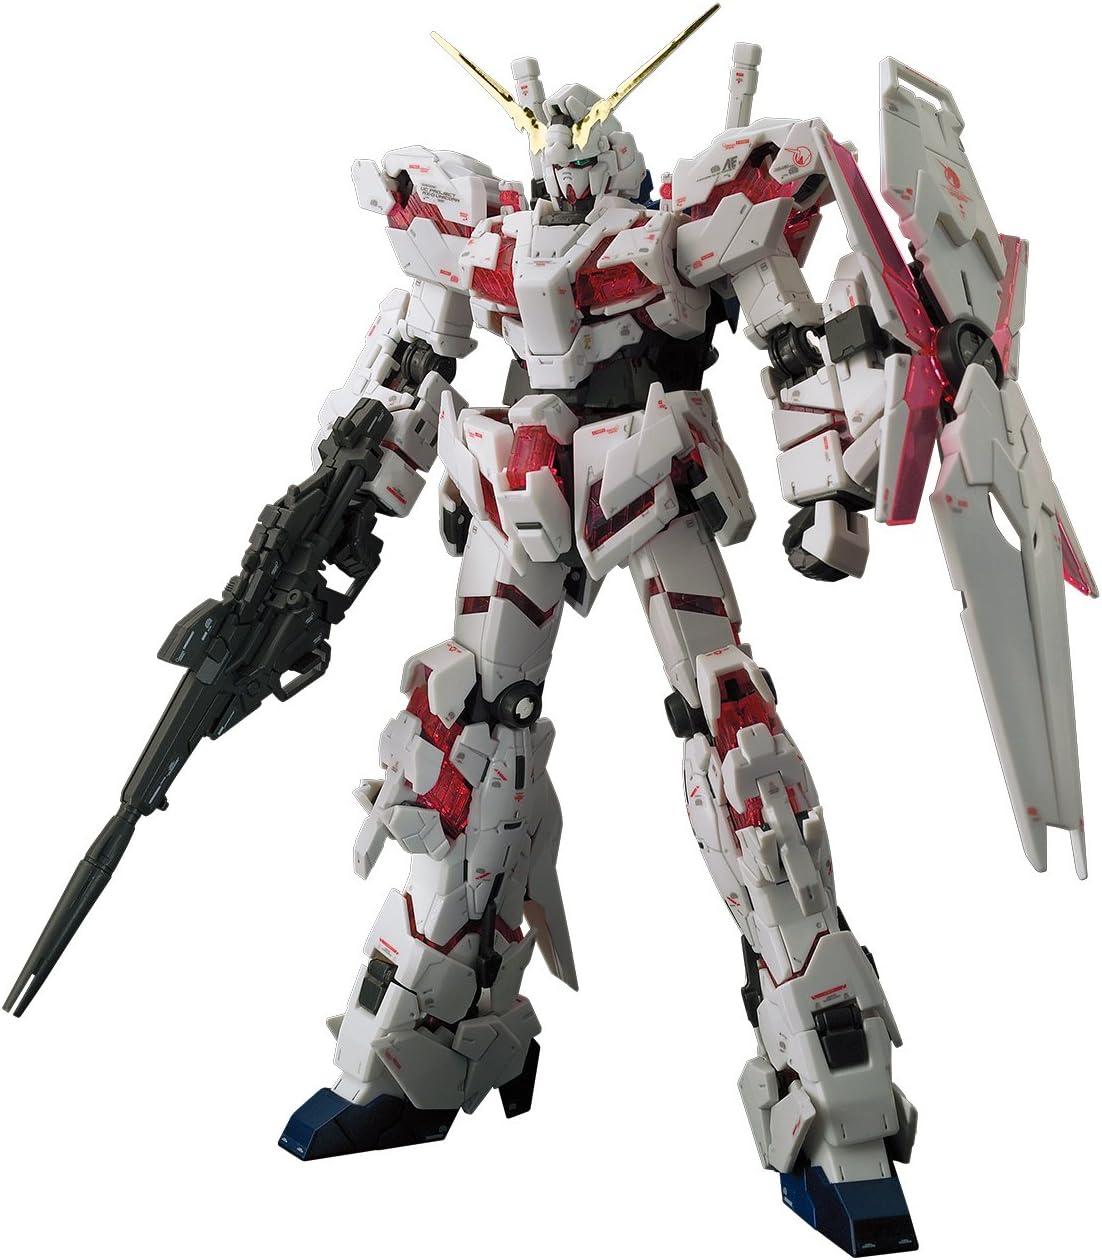 Gundam 1//144 RG #18 GN-0000+GNR-010 00 Raiser Model Kit Bandai US